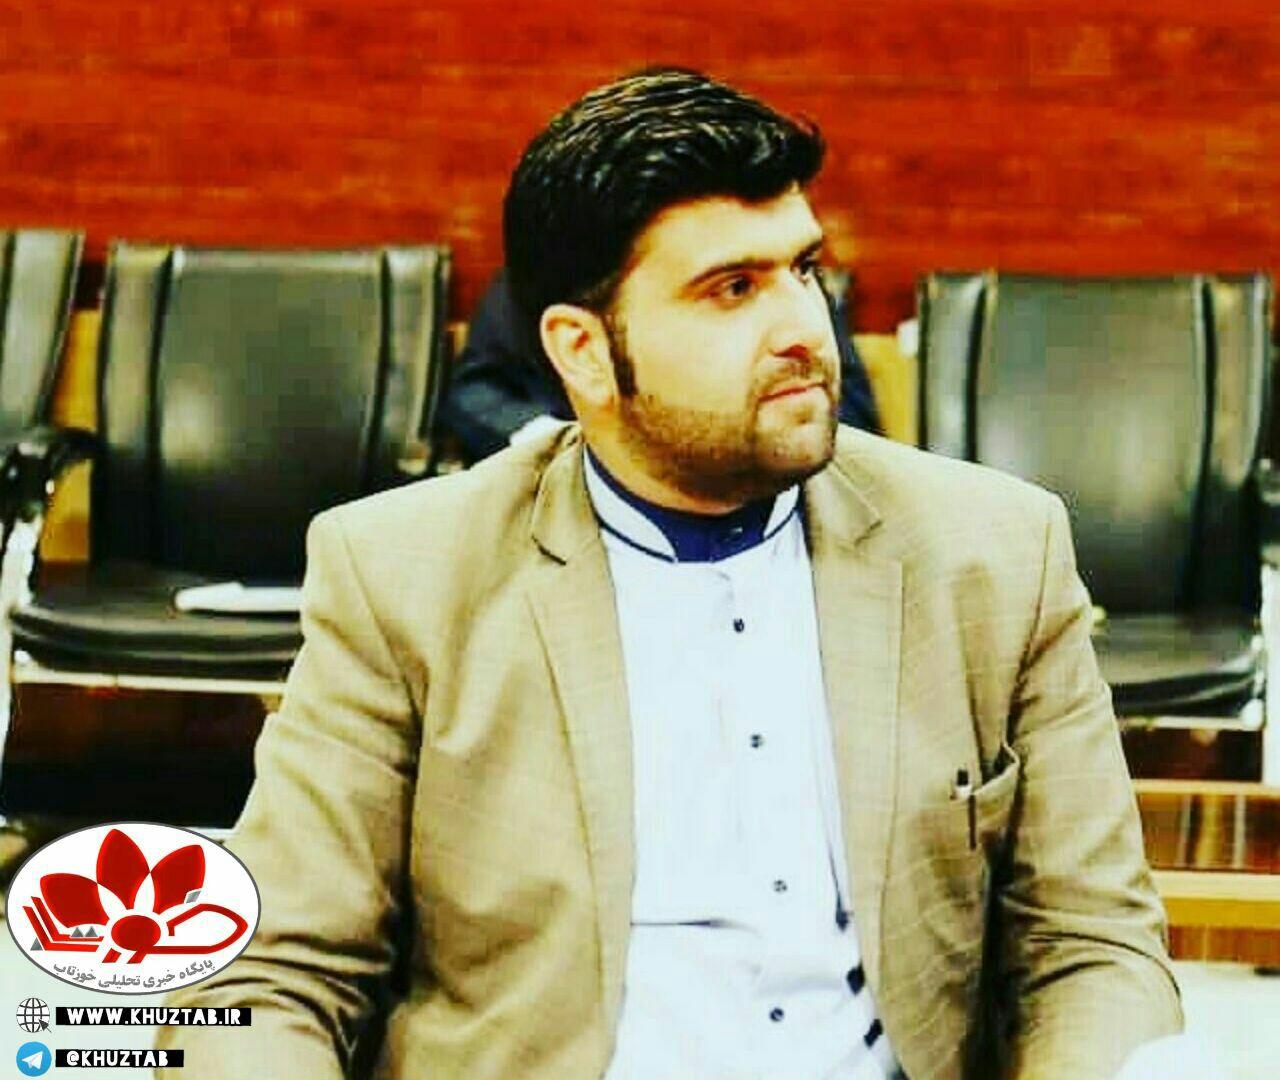 IMG 20200625 061541 421 علی زهیری مسئول روابط عمومی بهداشت شرق اهواز شد